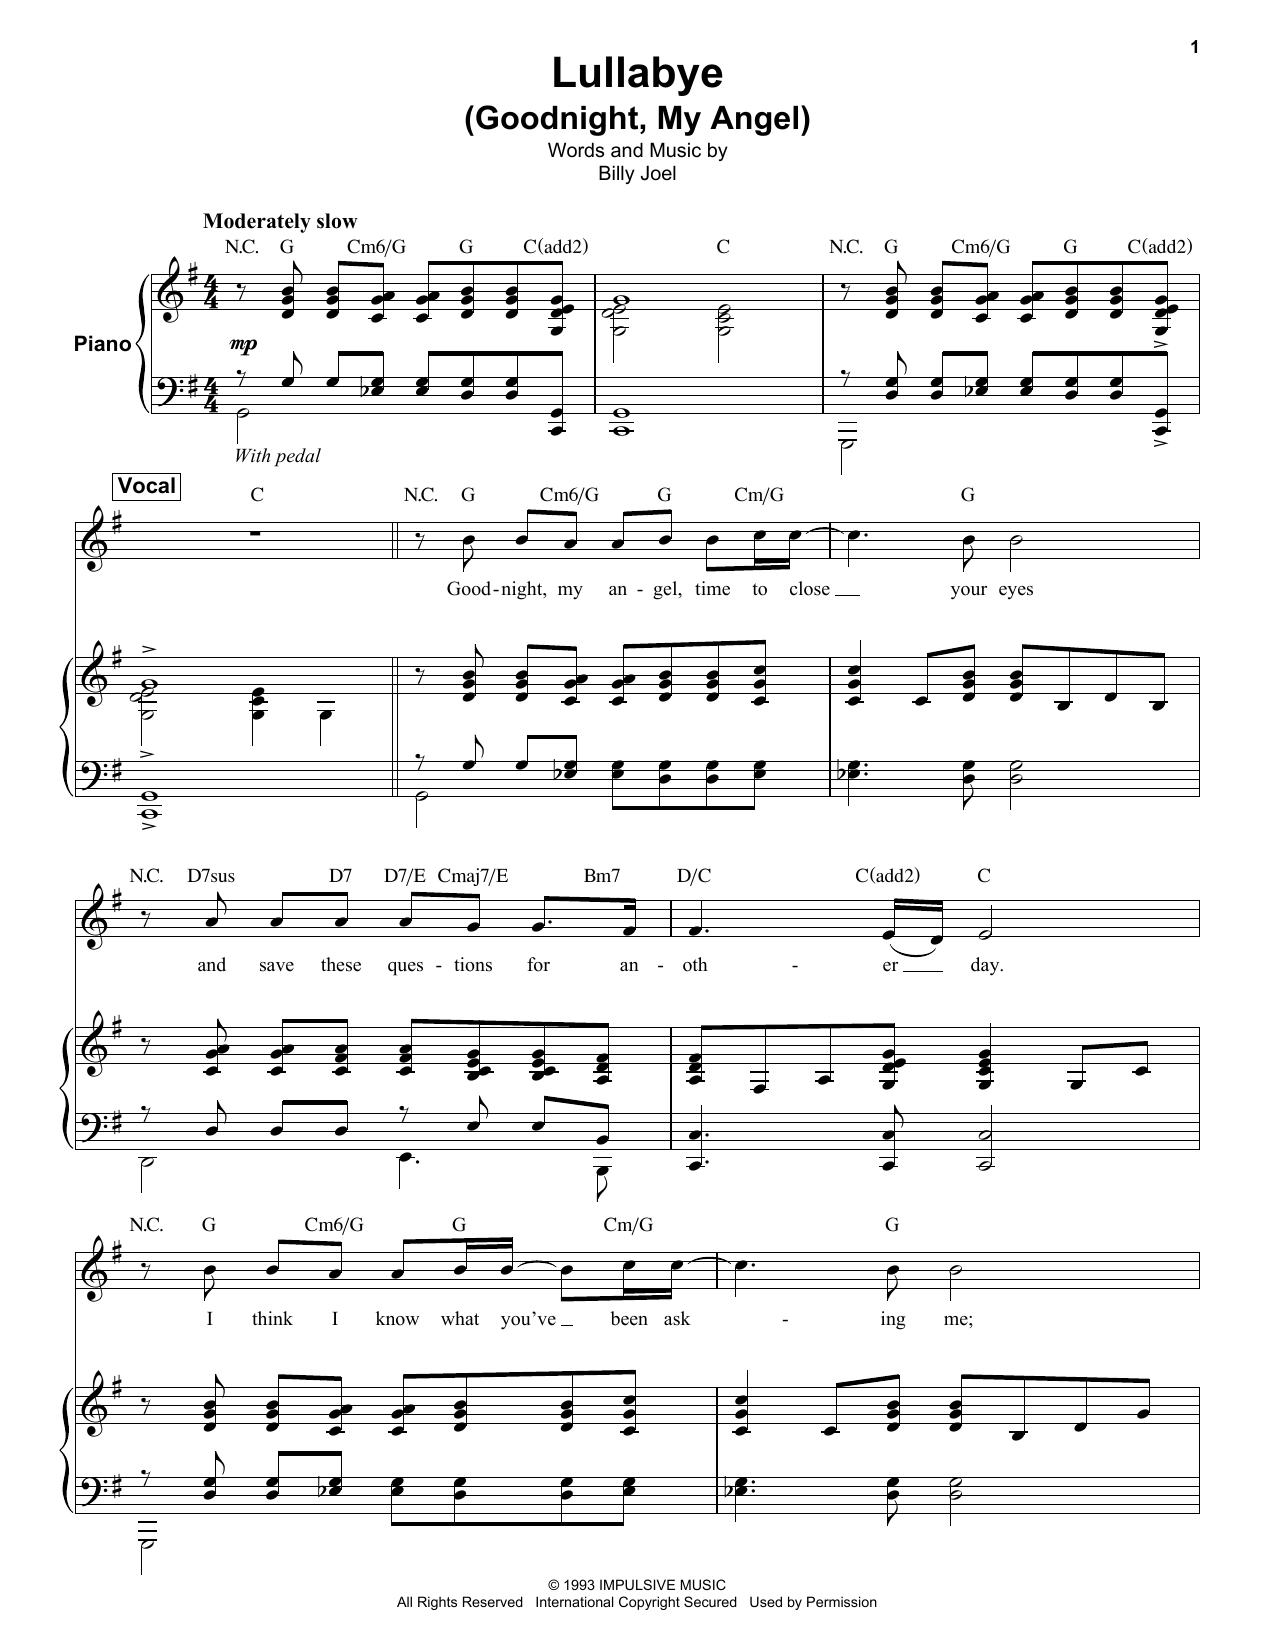 Billy Joel Lullaby Sheet Music : billy, lullaby, sheet, music, Lullabye, (Goodnight,, Angel), Sheet, Music, Billy, Keyboard, Transcription